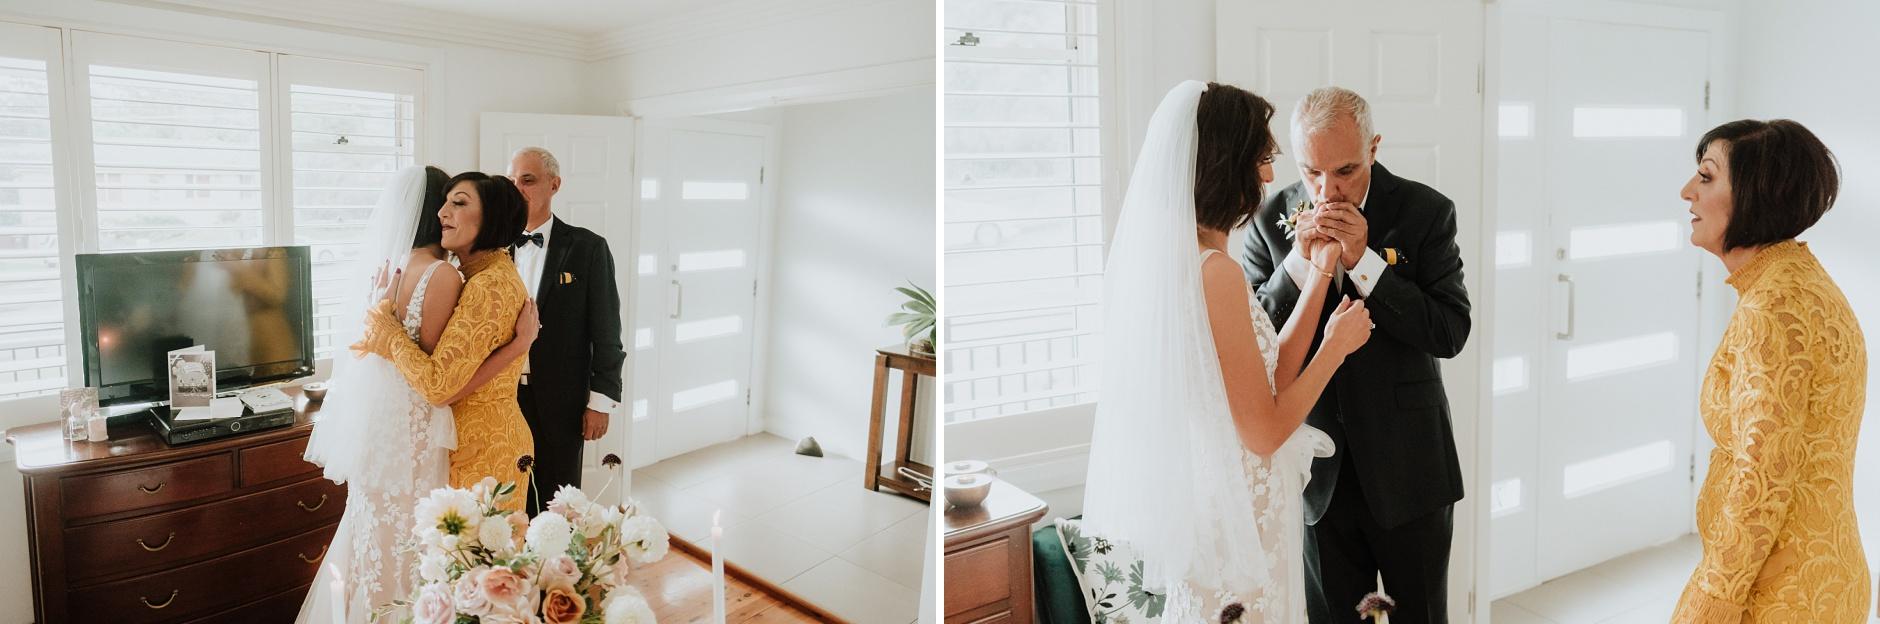 Sydney-Wedding-Photographer_0079.jpg